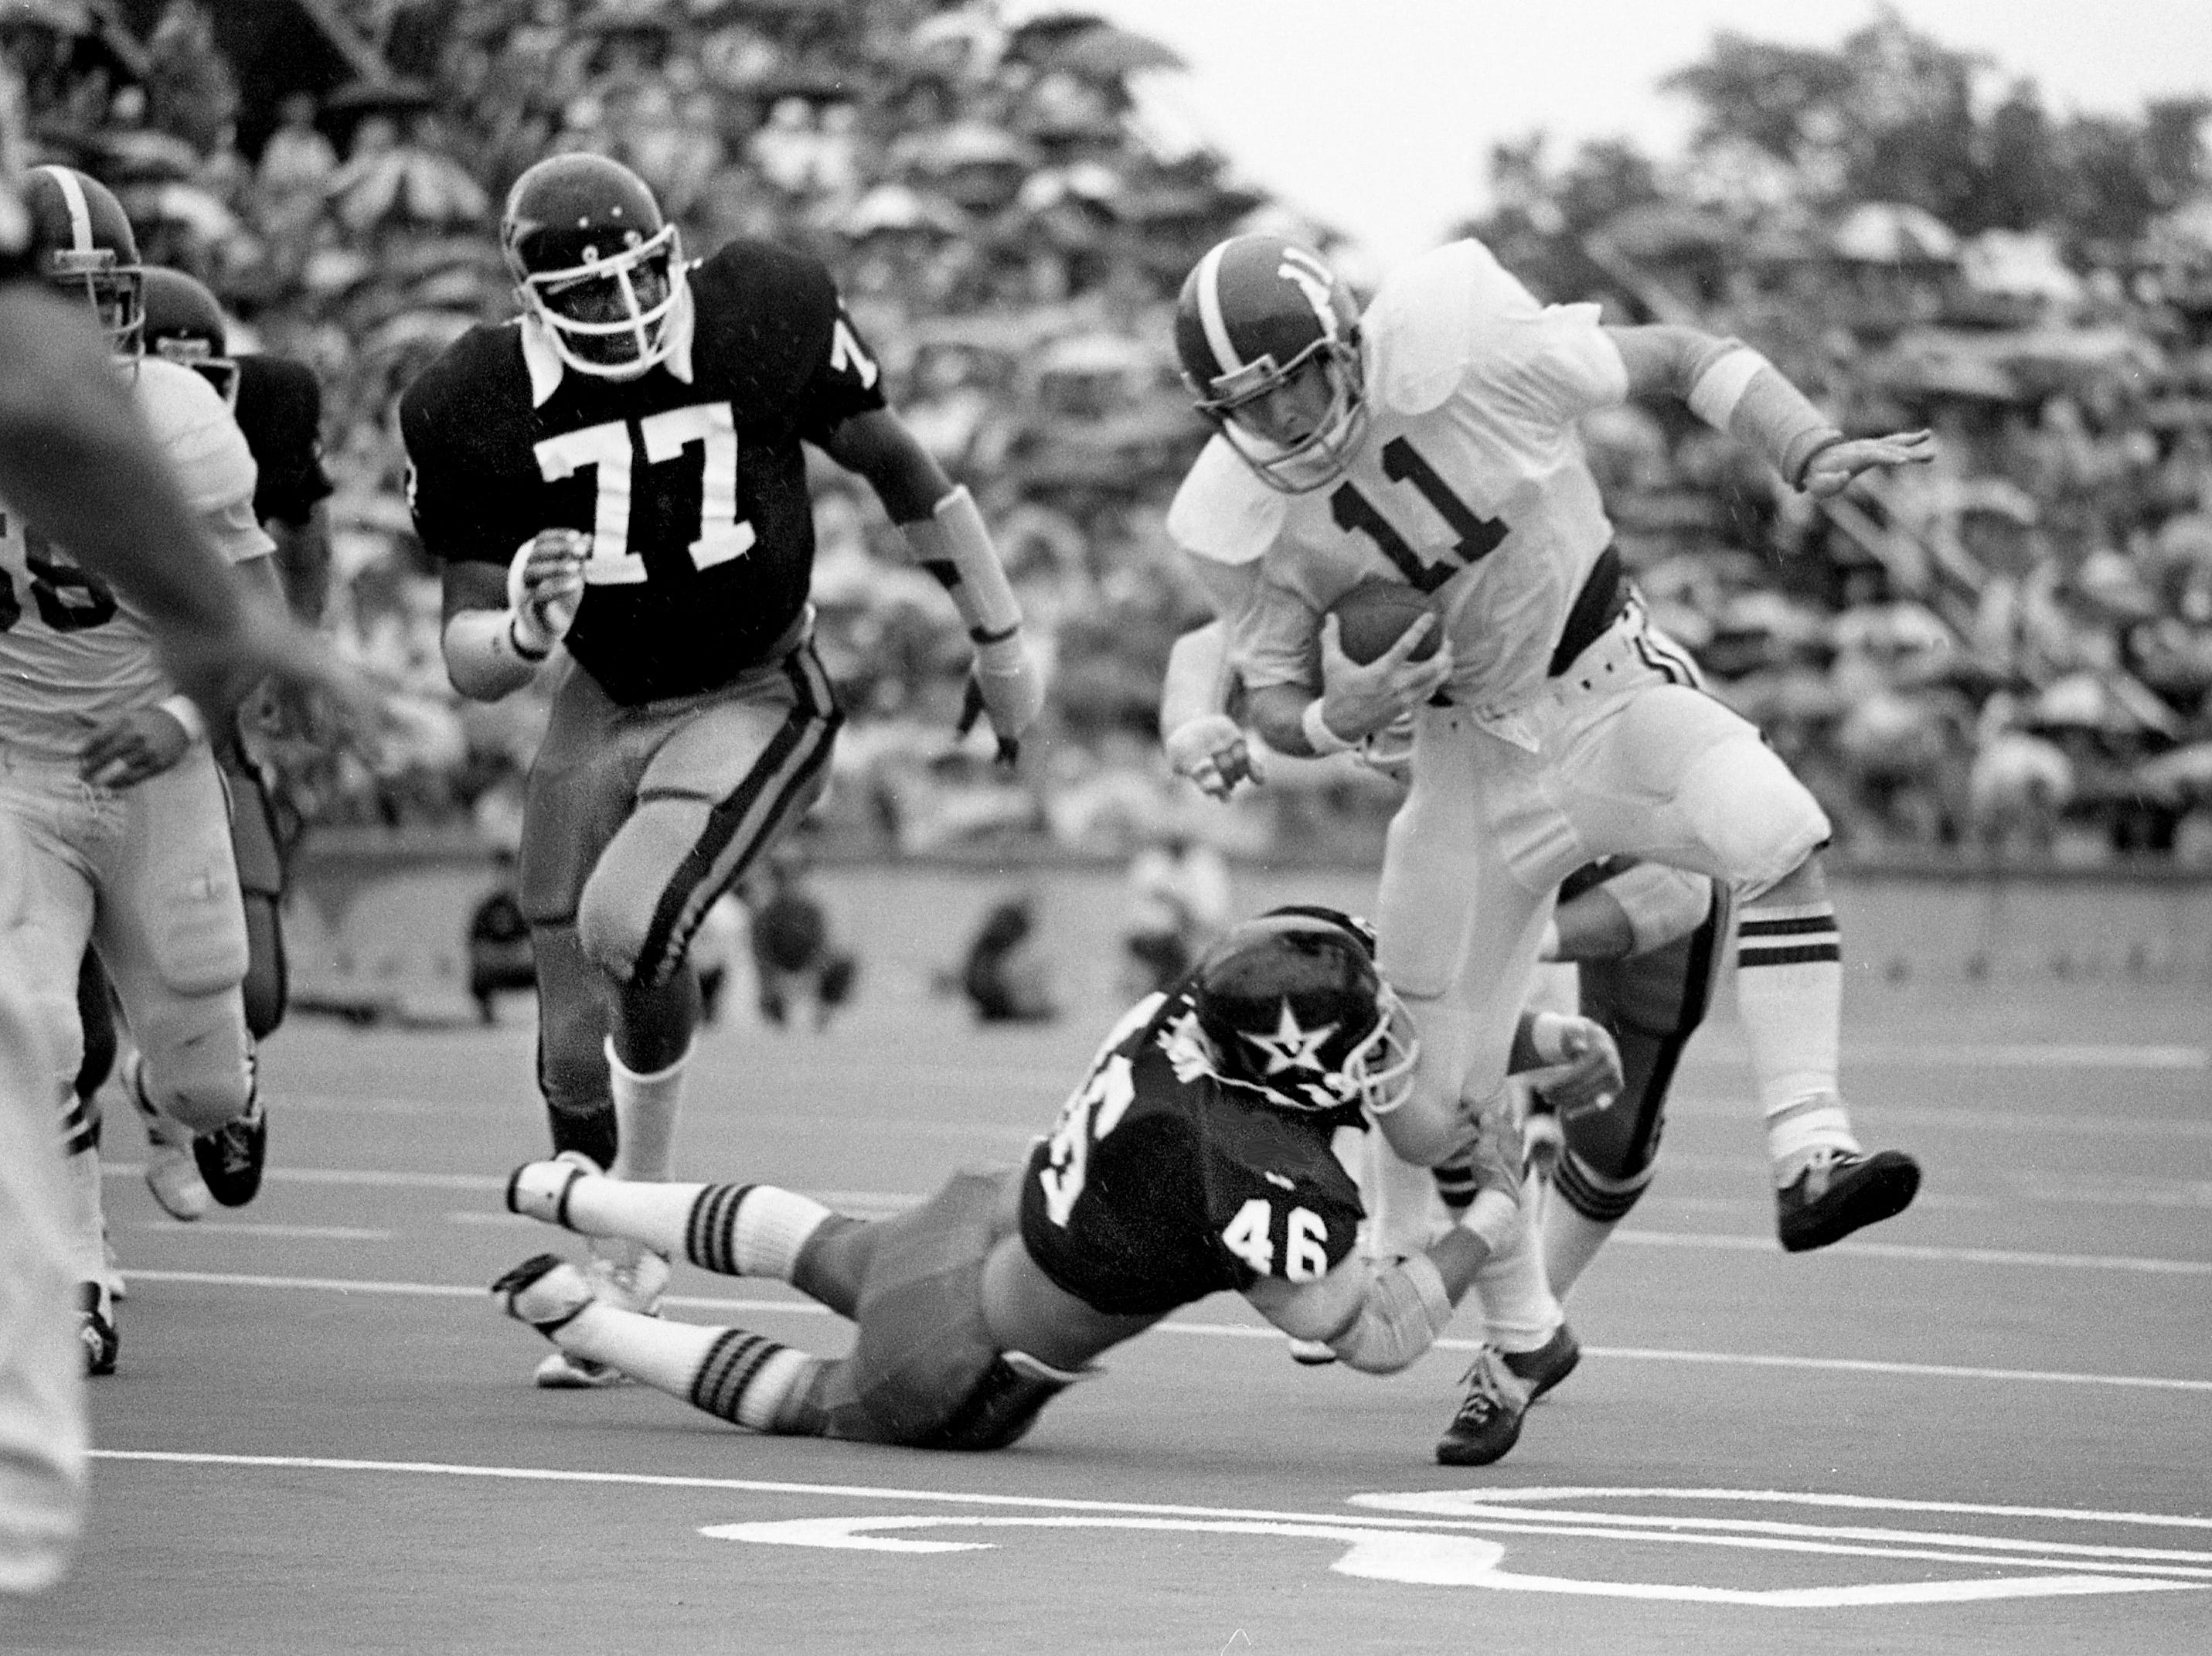 Alabama quarterback Jeff Rutledge (11) is getting grabbed by Vanderbilt linebacker Randy Sittason (46) as Sittason's teammate Dennis Harrison (77) moves in. The Crimson Tide won 24-12 over the Commodores at Dudley Field Sept. 24, 1977.